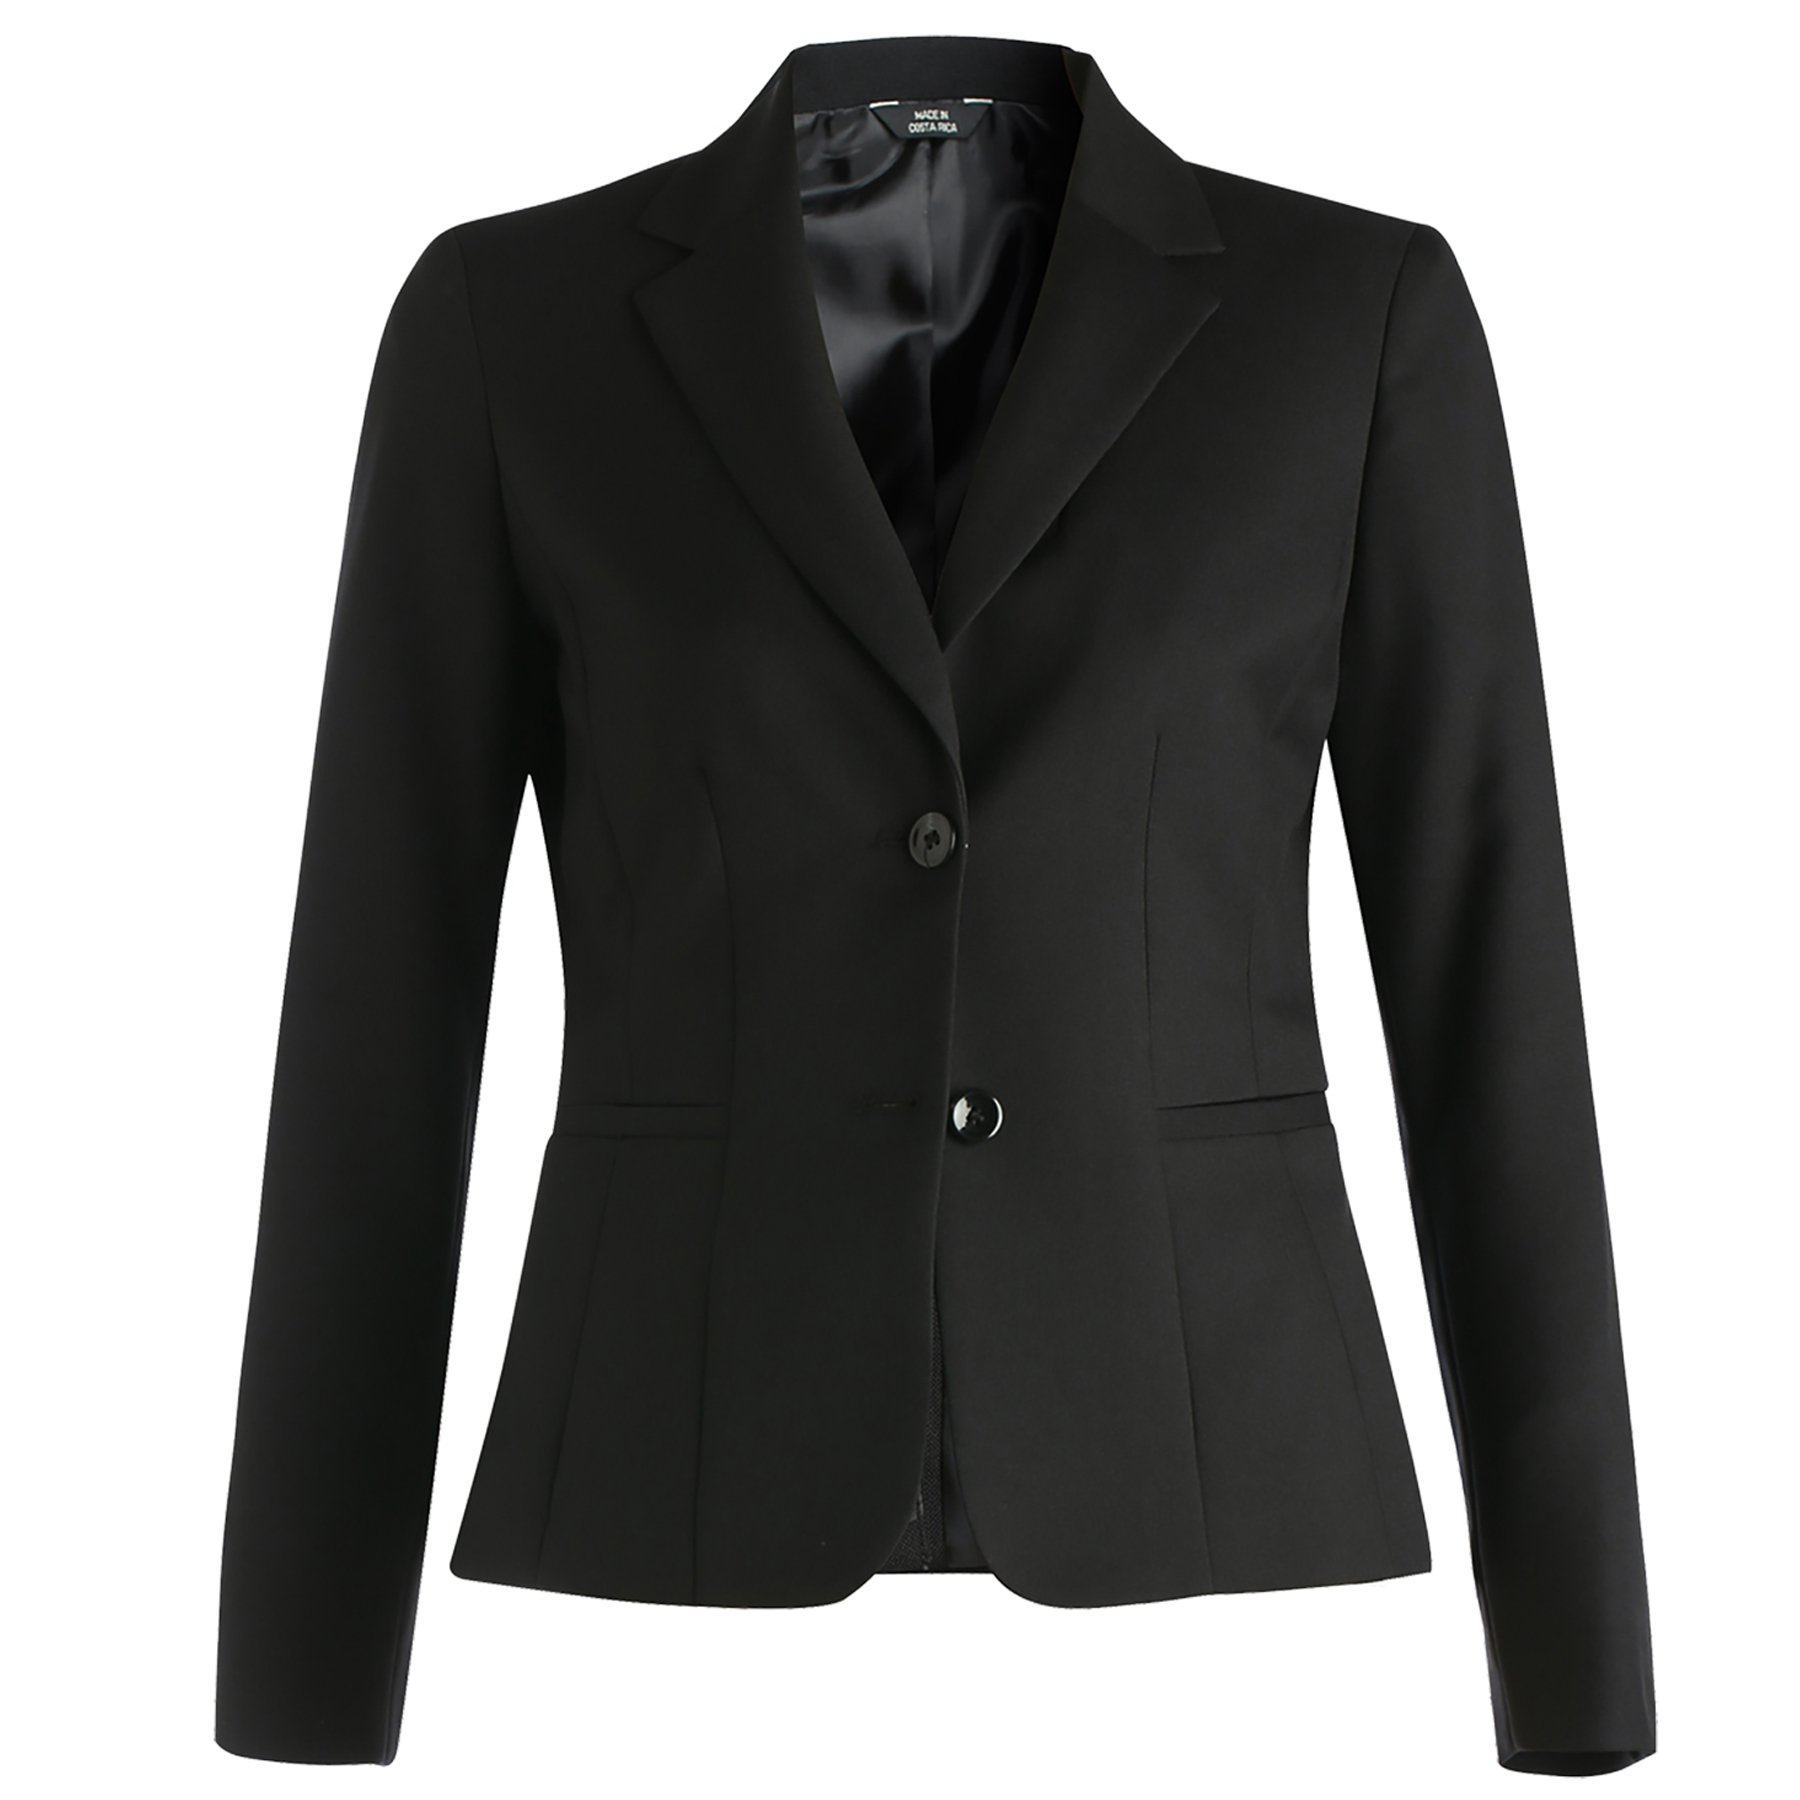 Averill's Sharper Uniforms Women's Ladies Extreme Washable Hotel Single Breasted Suit Coat 12 Black